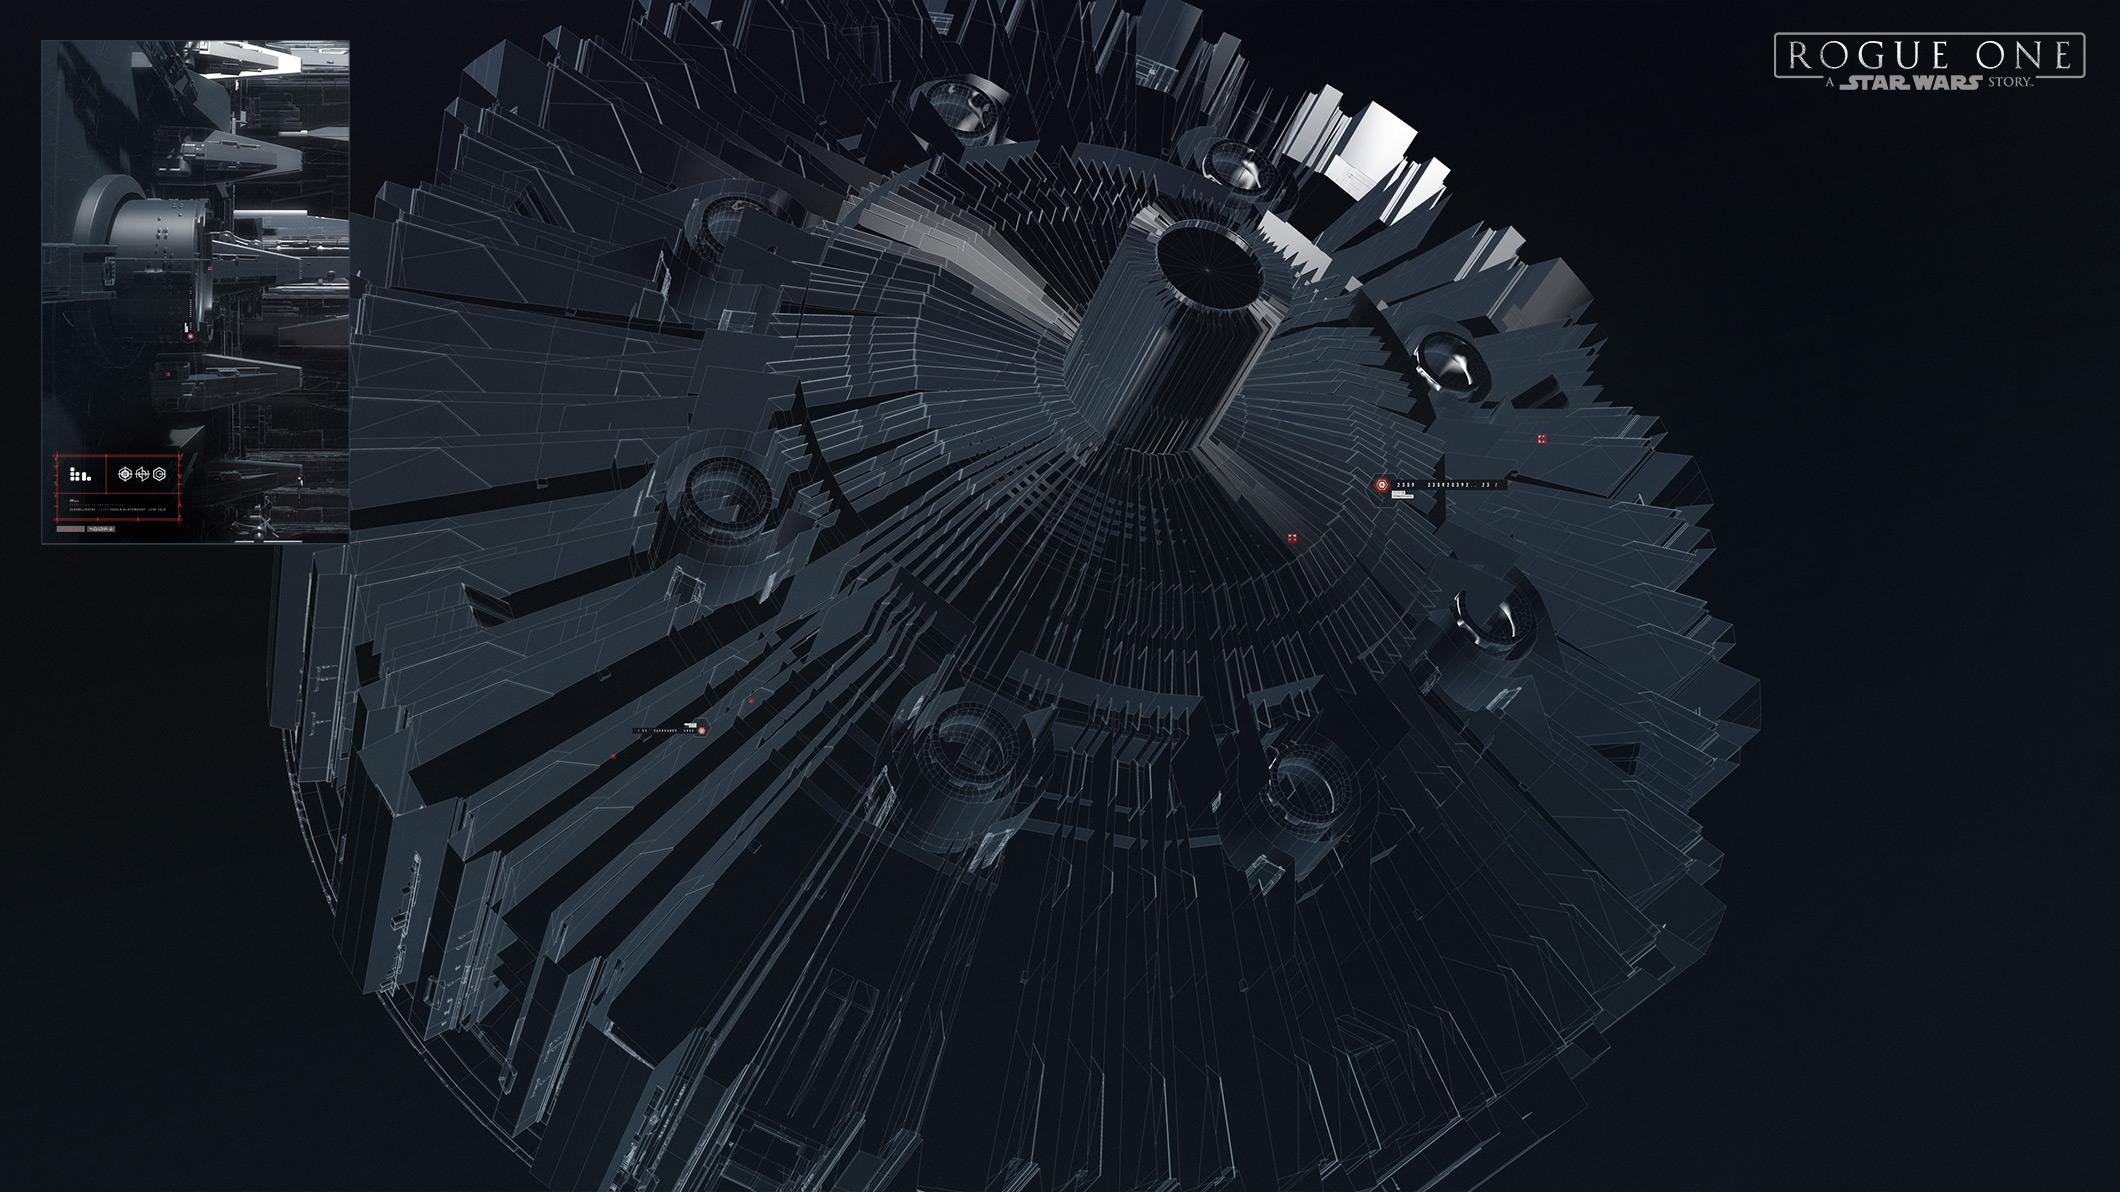 The Rogue One Death Star Plans Hd Wallpaper 5 Geek Carl